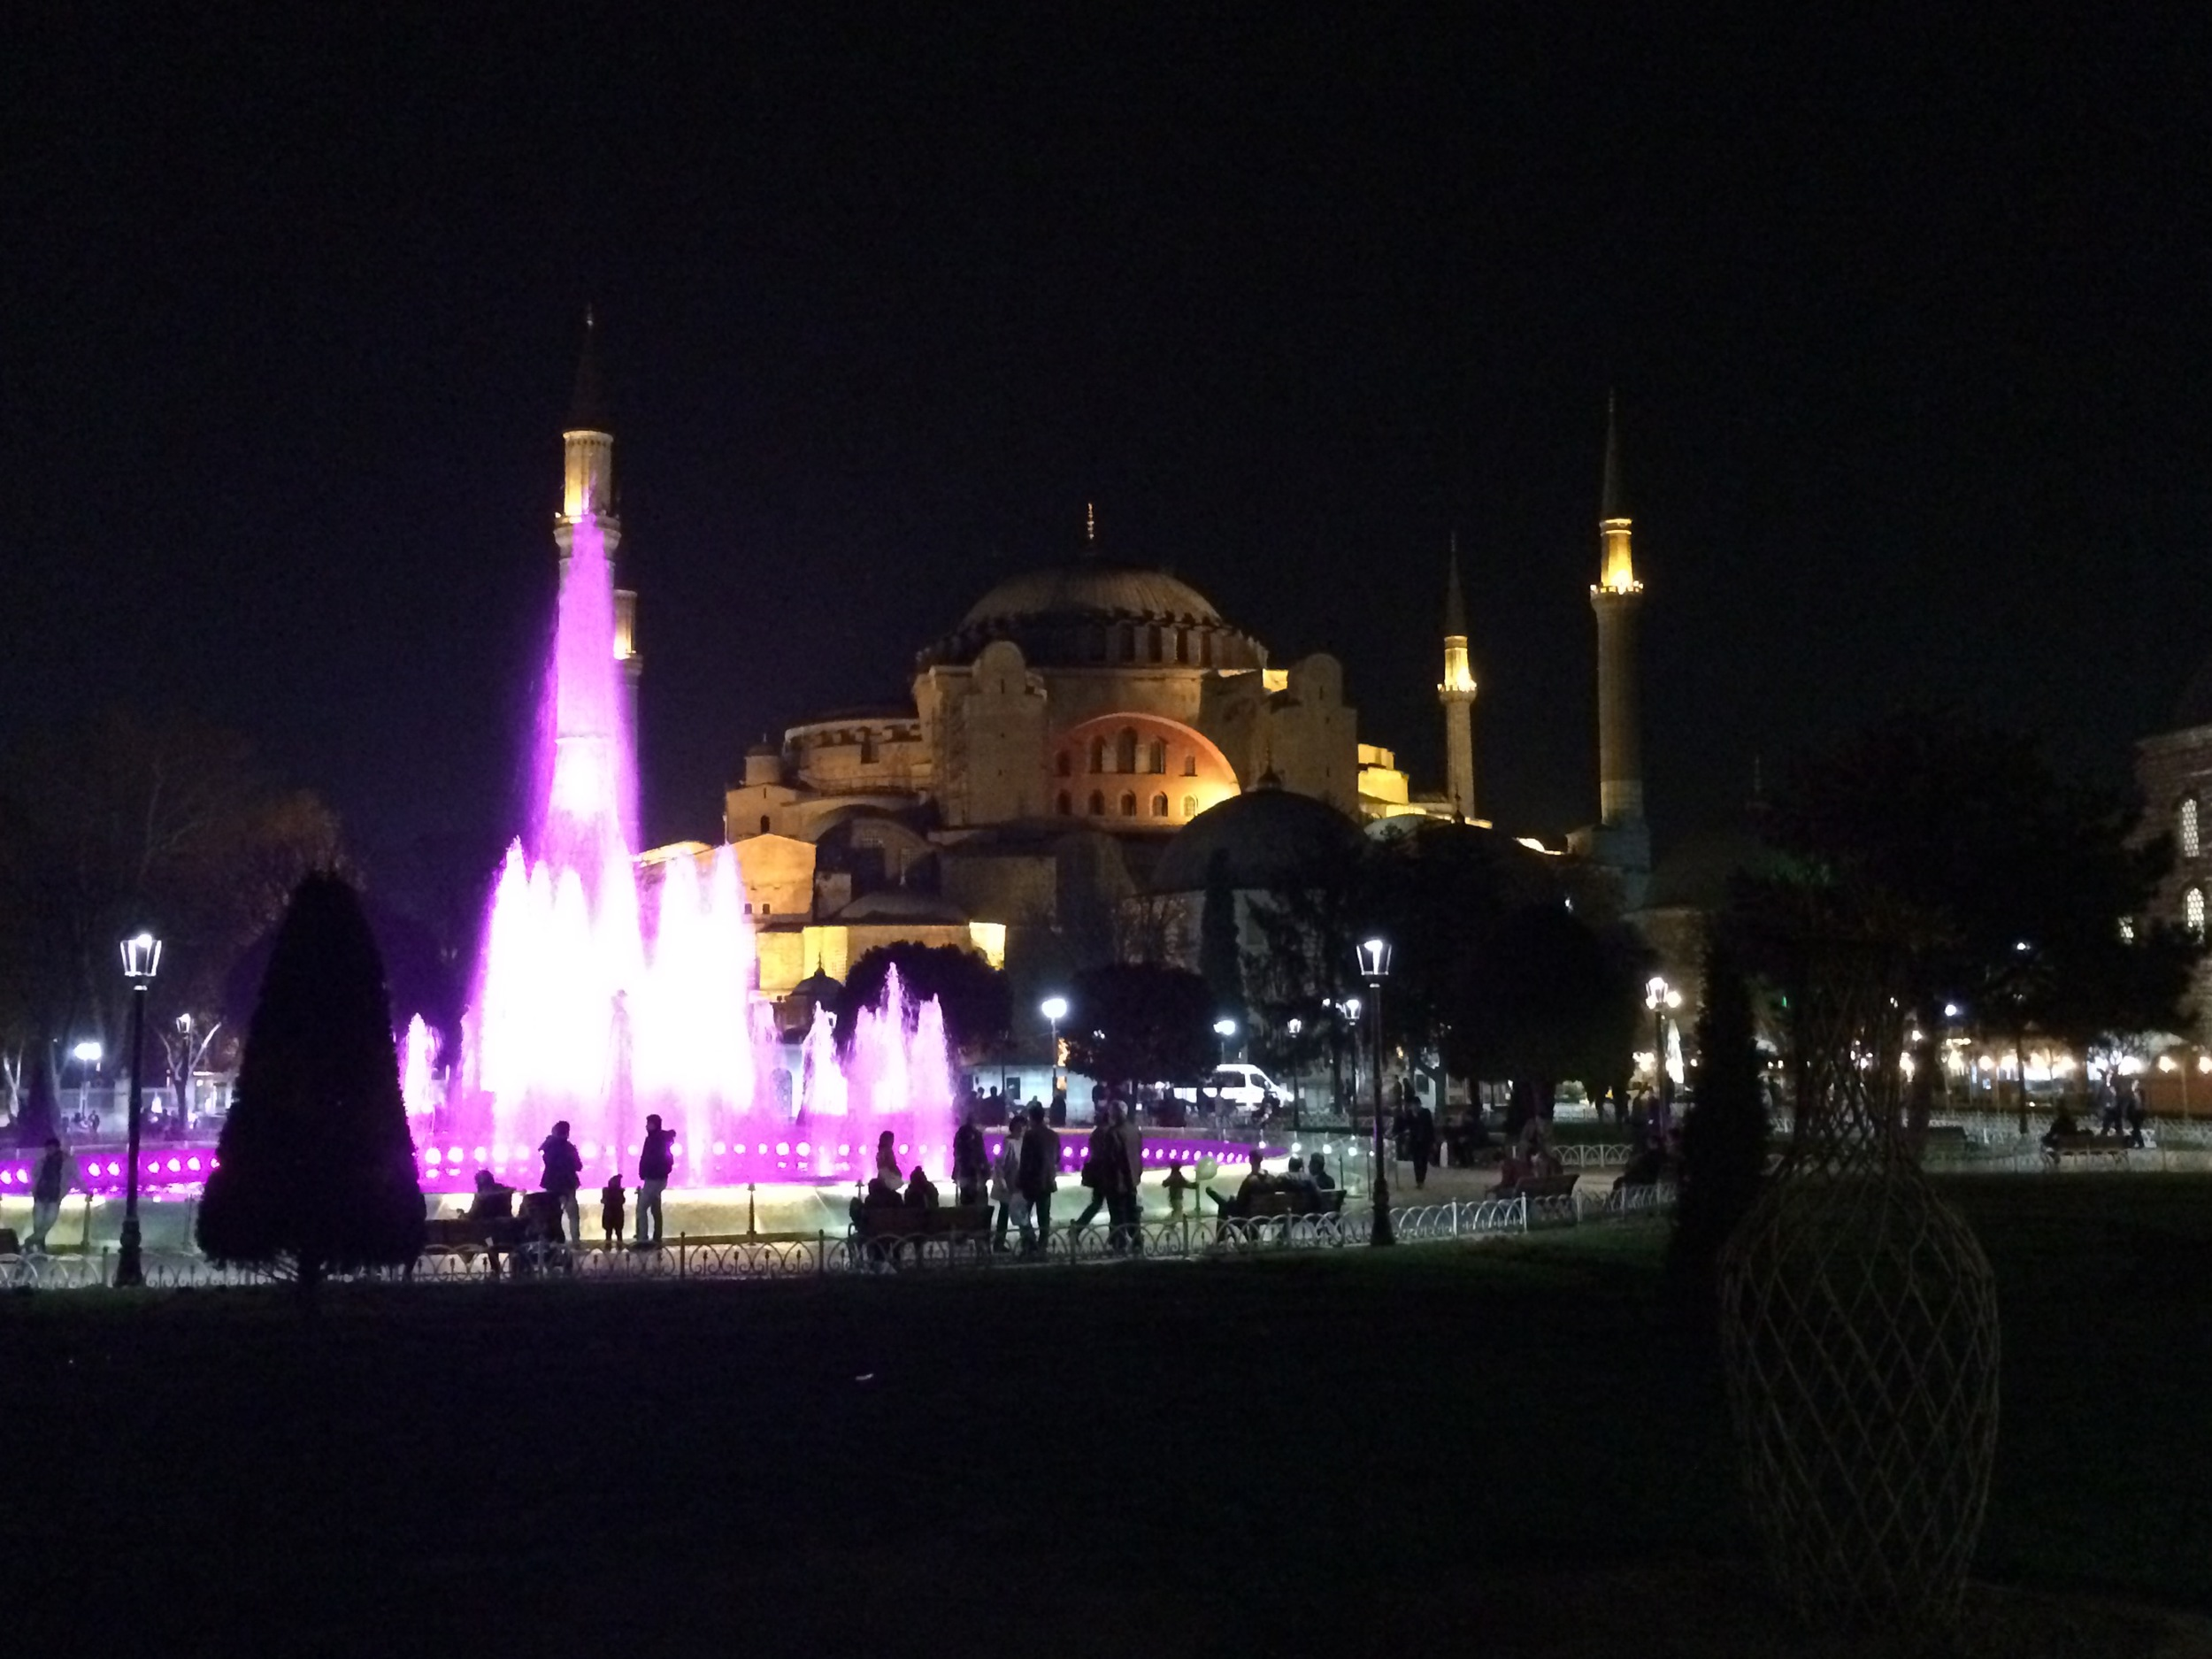 The Hagia Sophia at night.